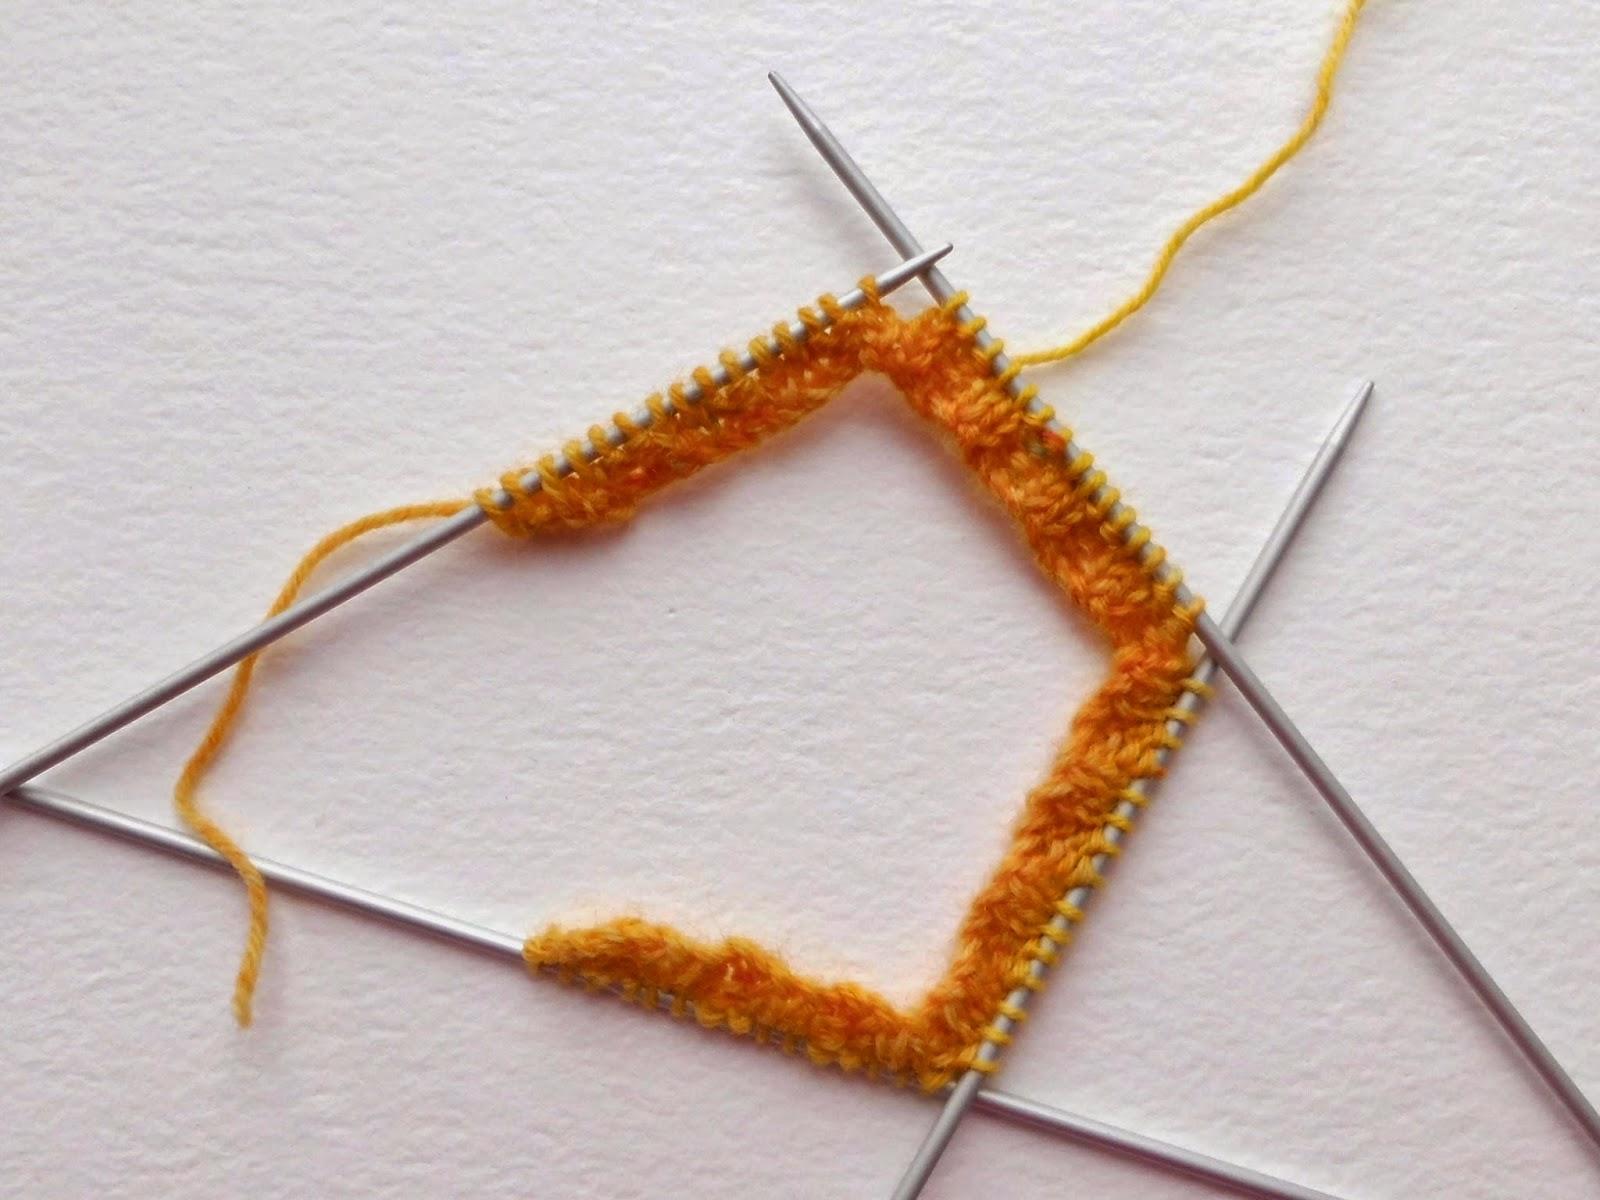 Beginner sock knitting - Winwick Mum Sockalong - joining into the round on DPNs